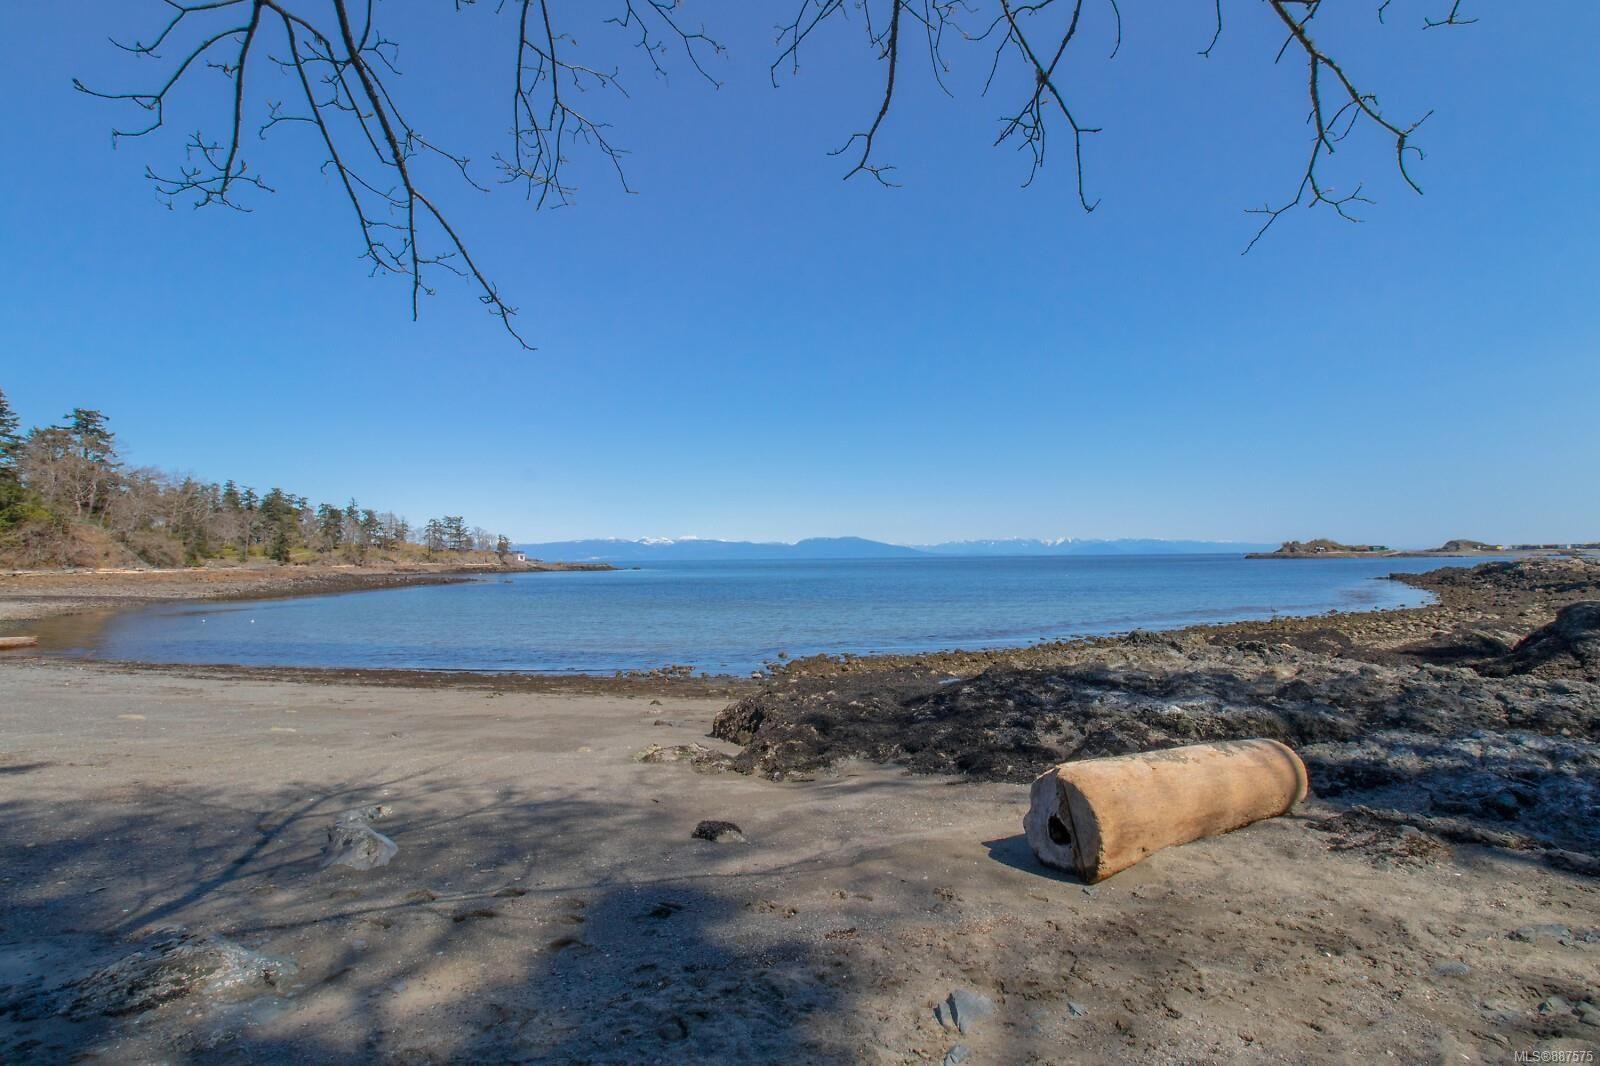 Main Photo: 3974 Hammond Bay Rd in : Na Hammond Bay Land for sale (Nanaimo)  : MLS®# 887575